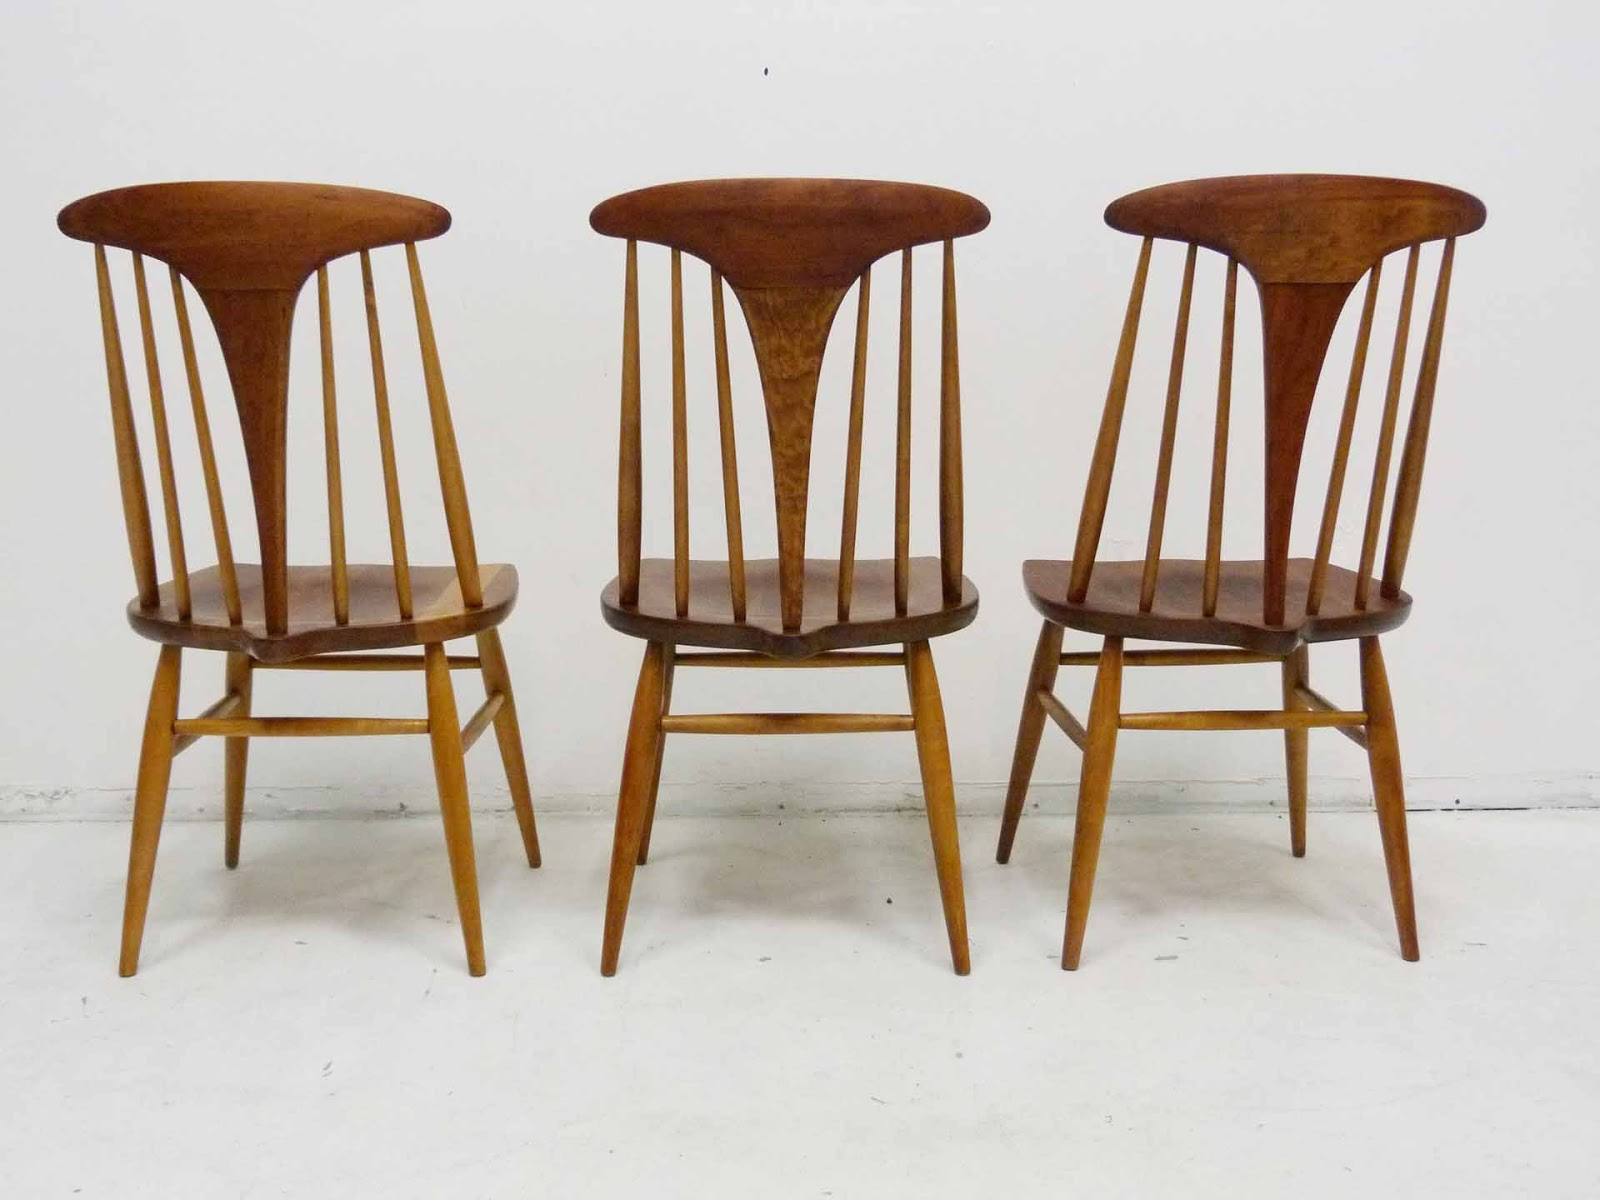 Heywood Wakefield Chairs Dining Uk Modern Mid Century Danish Vintage Furniture Shop Used